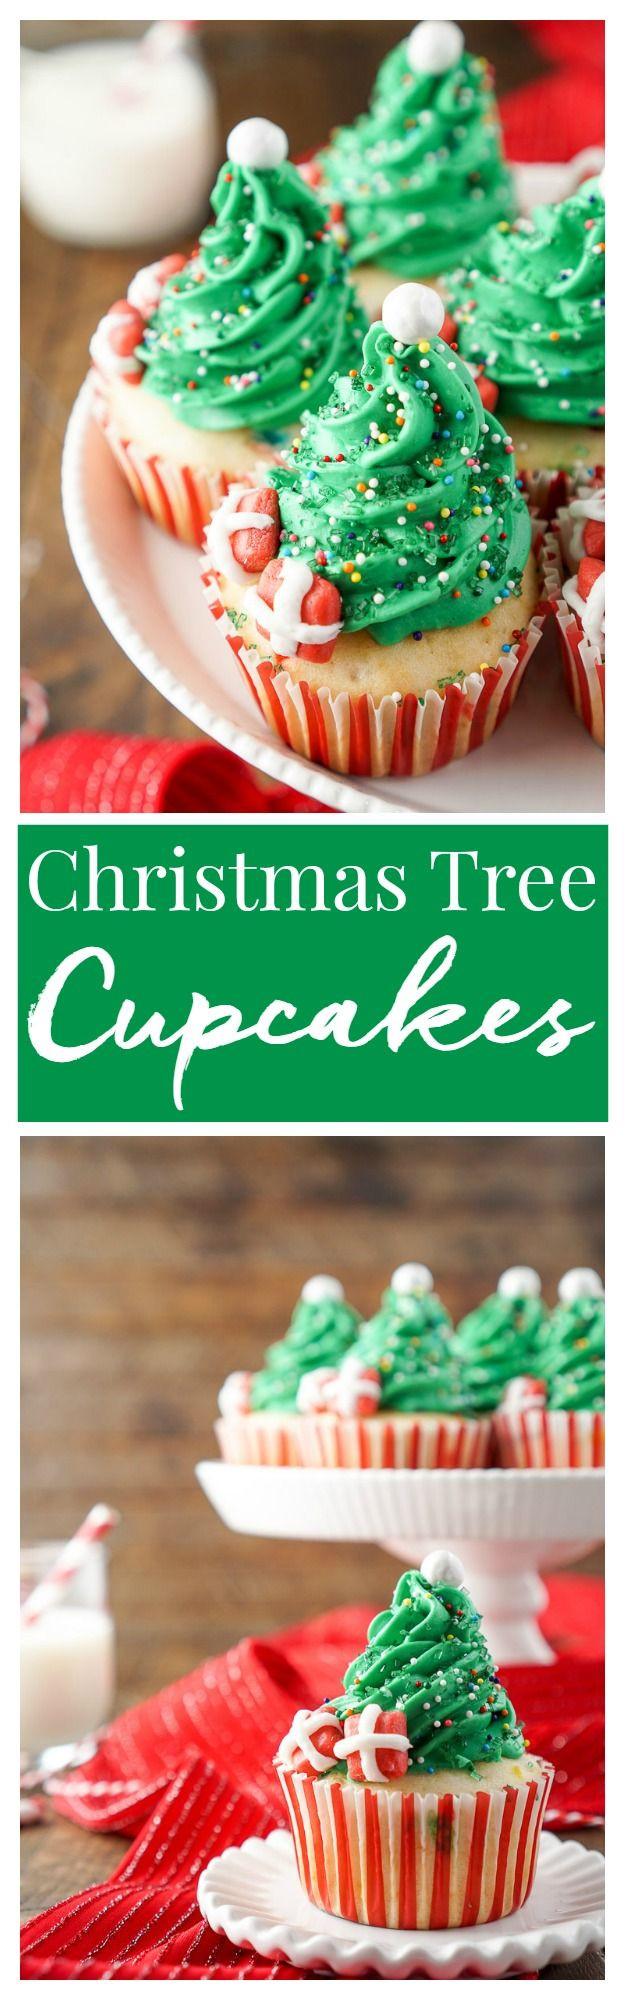 Cute Easy Christmas Desserts  Best 25 Cute christmas desserts ideas on Pinterest